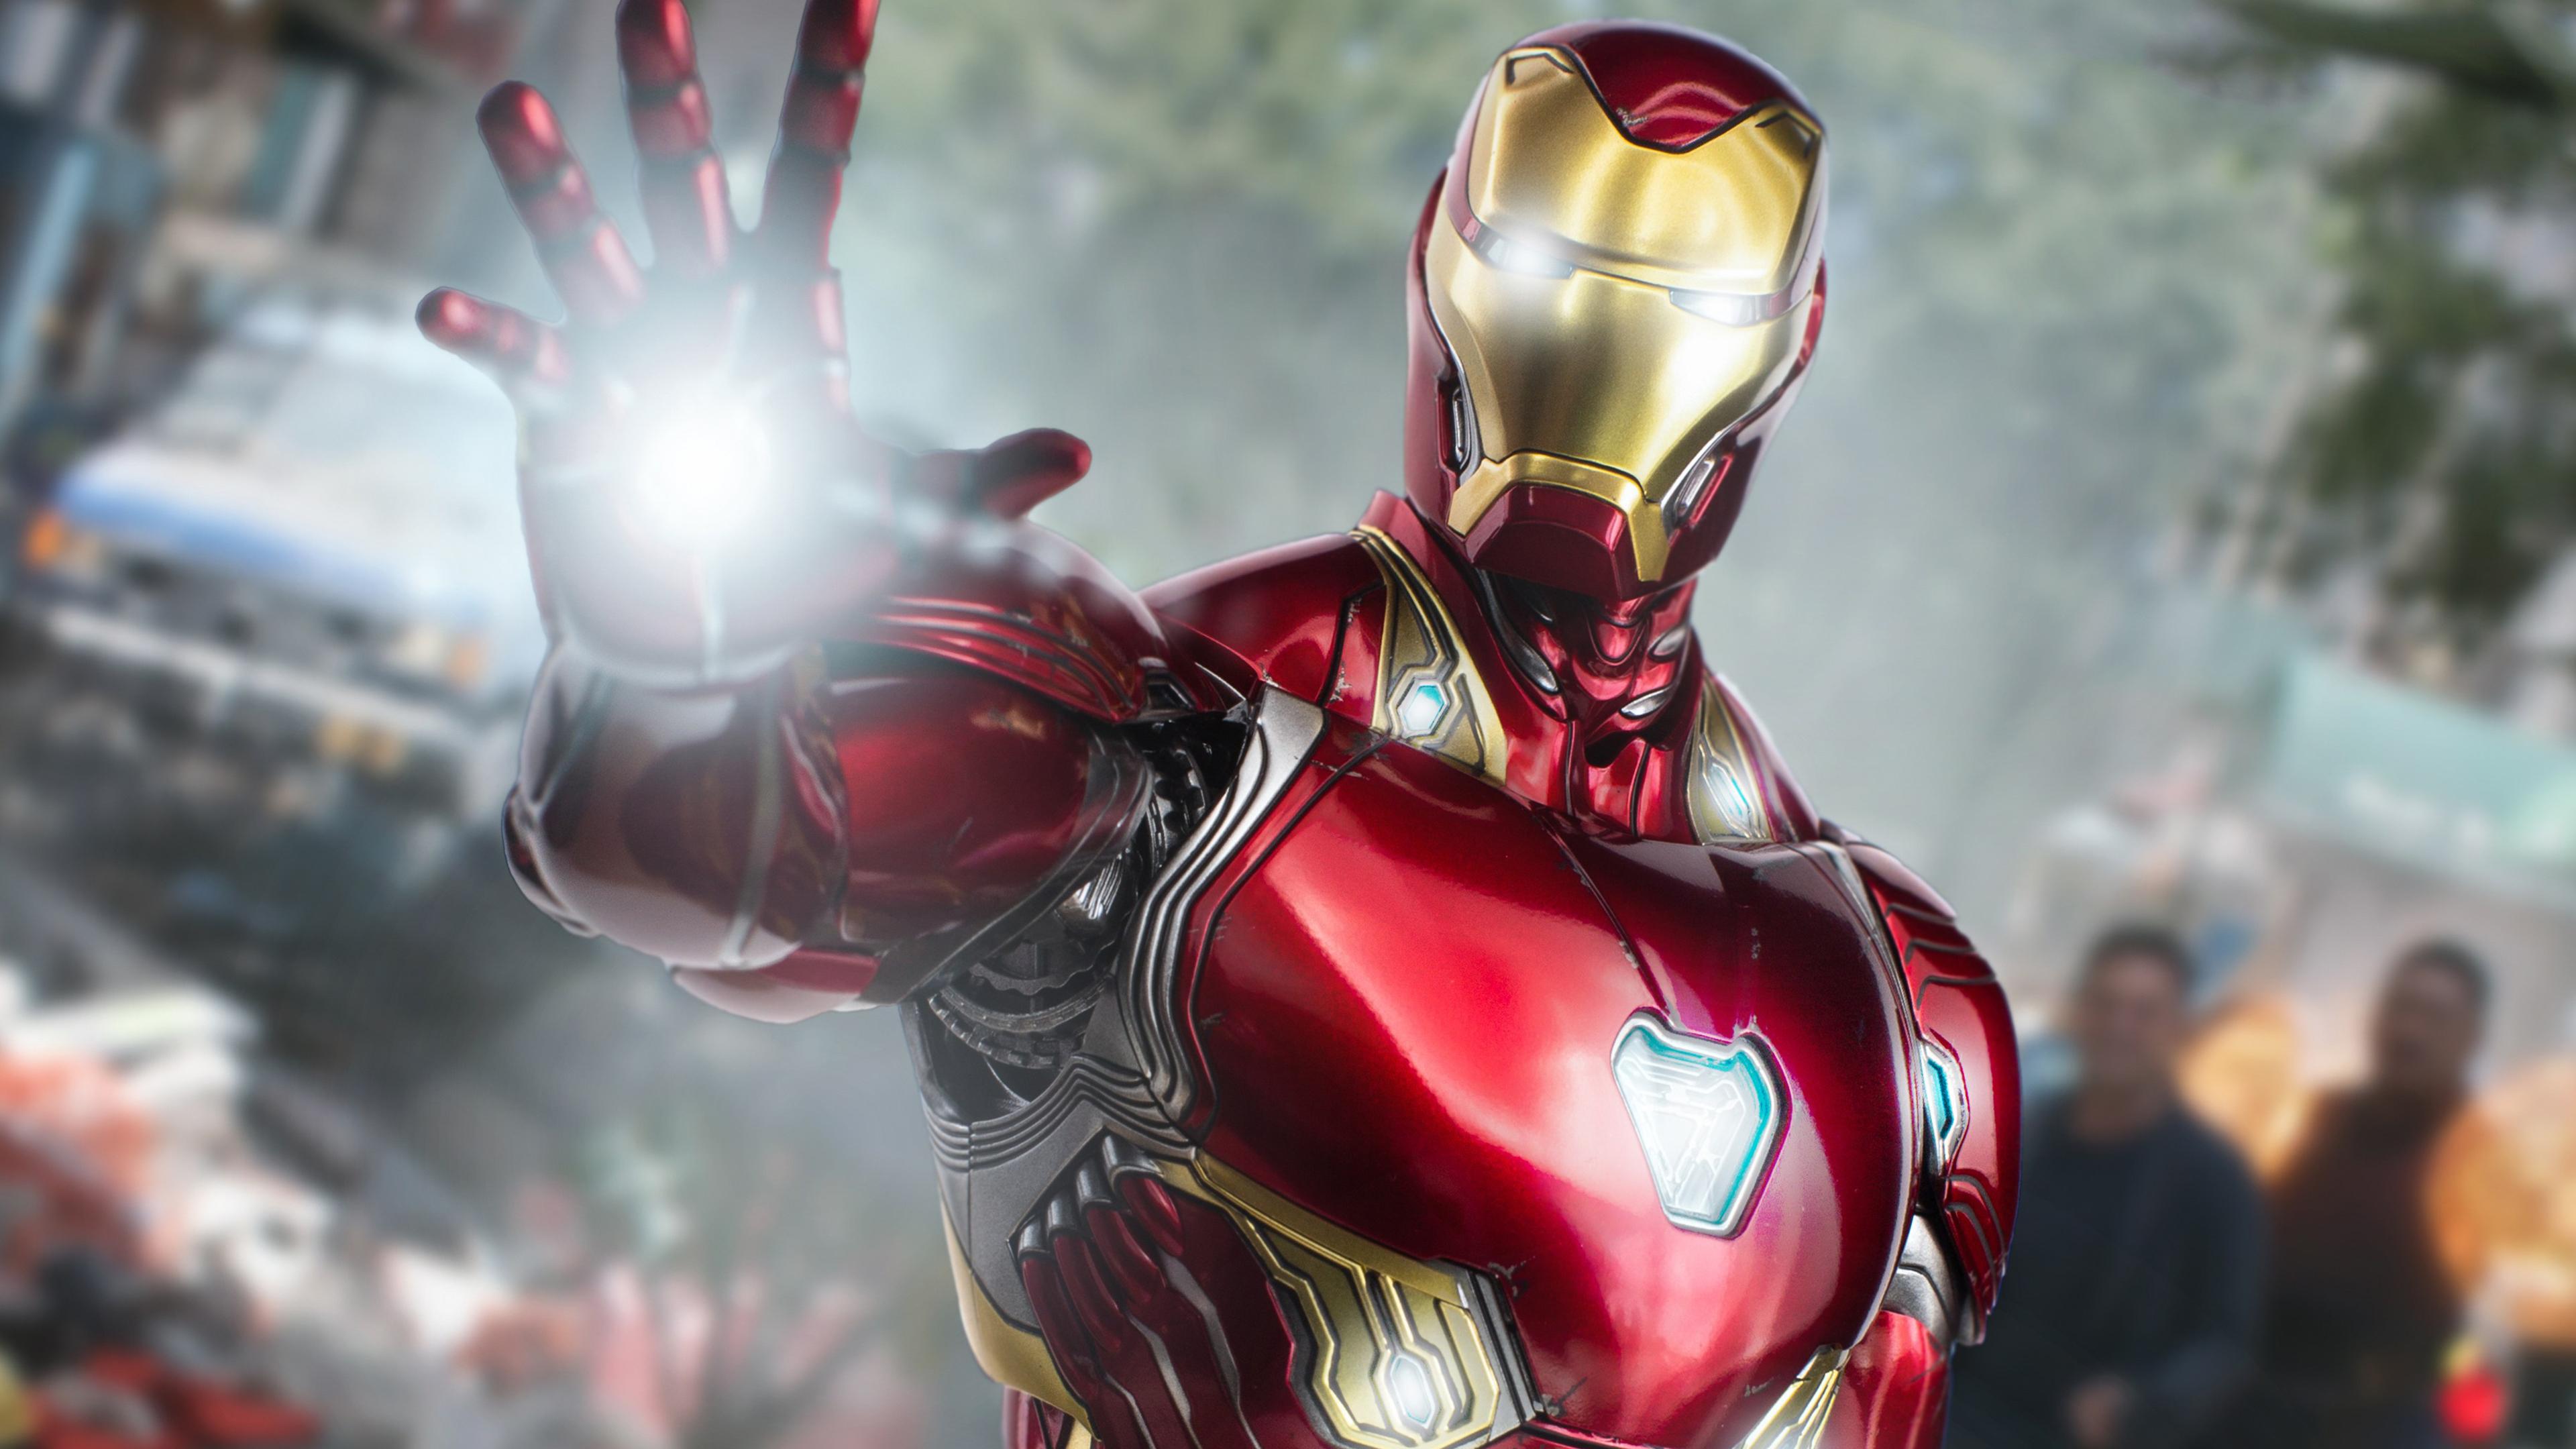 Pc Wallpaper Iron Man 4k , HD Wallpaper & Backgrounds